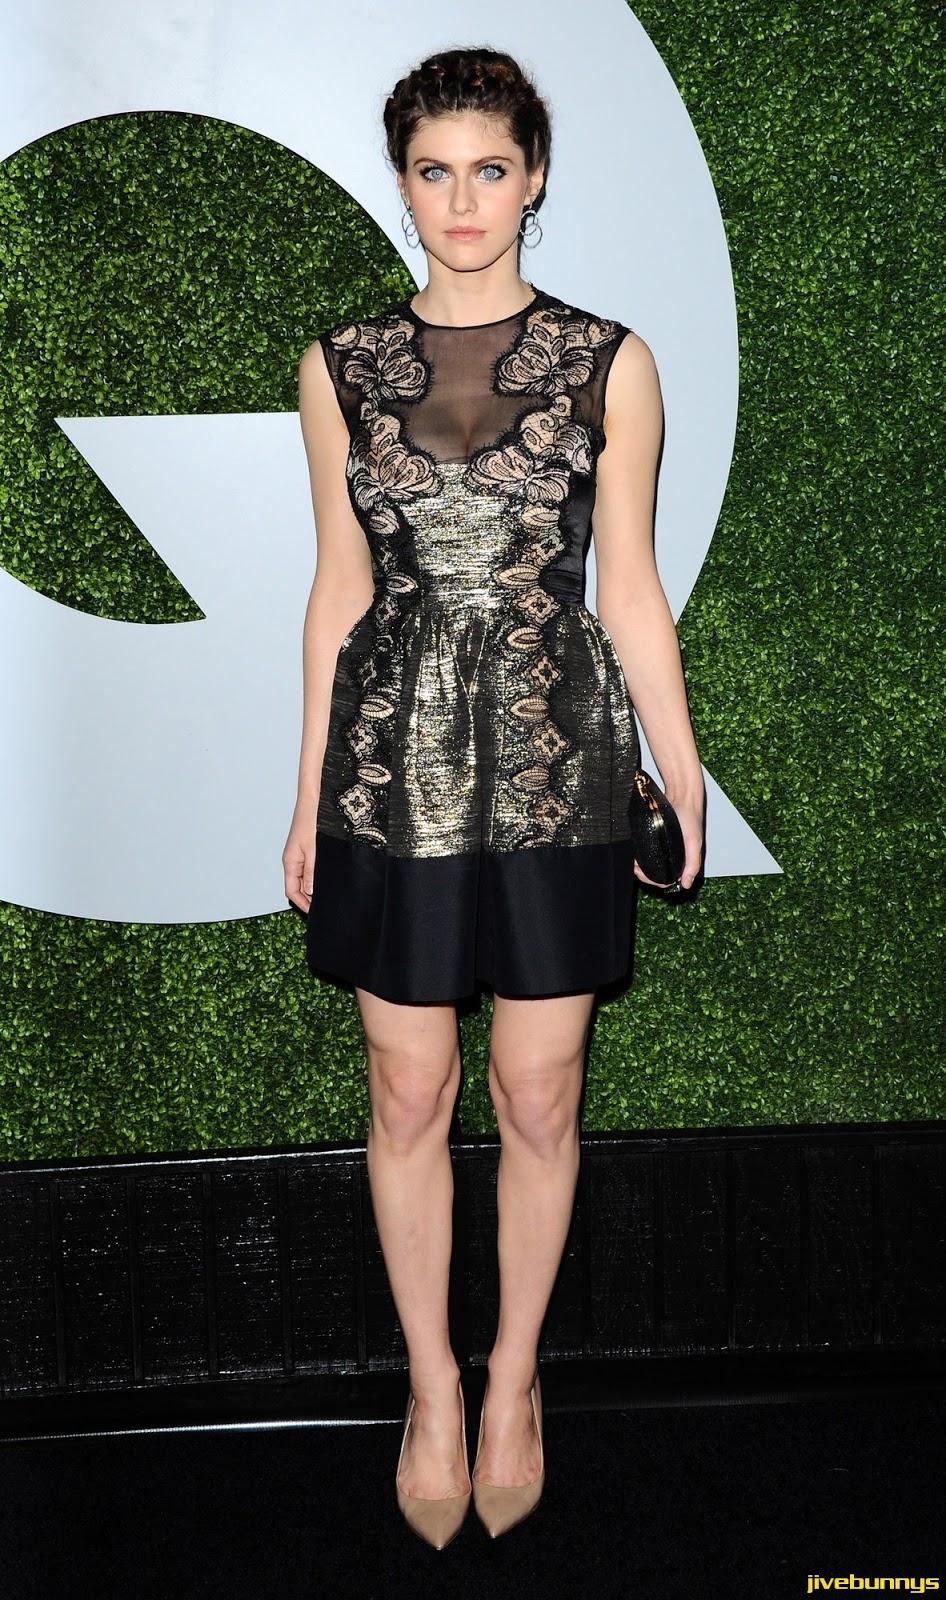 Alexandra Daddario - 2014 GQ Men Of The Year Party in LA 12/04/14